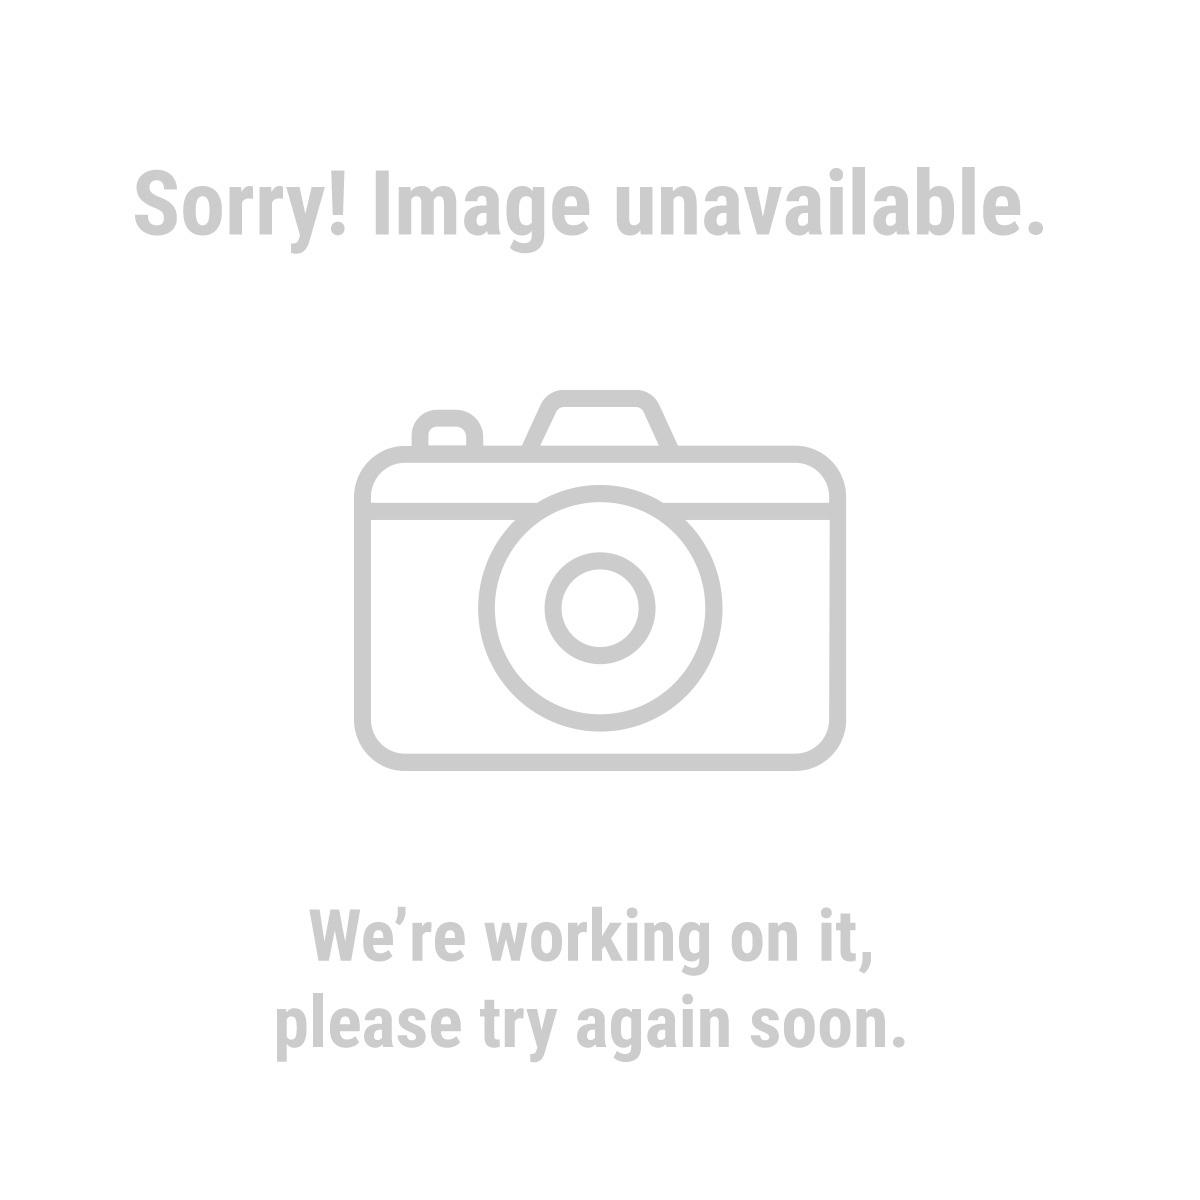 Western Safety 60450 Split Leather Work Gloves with Cotton Back 5 Pr